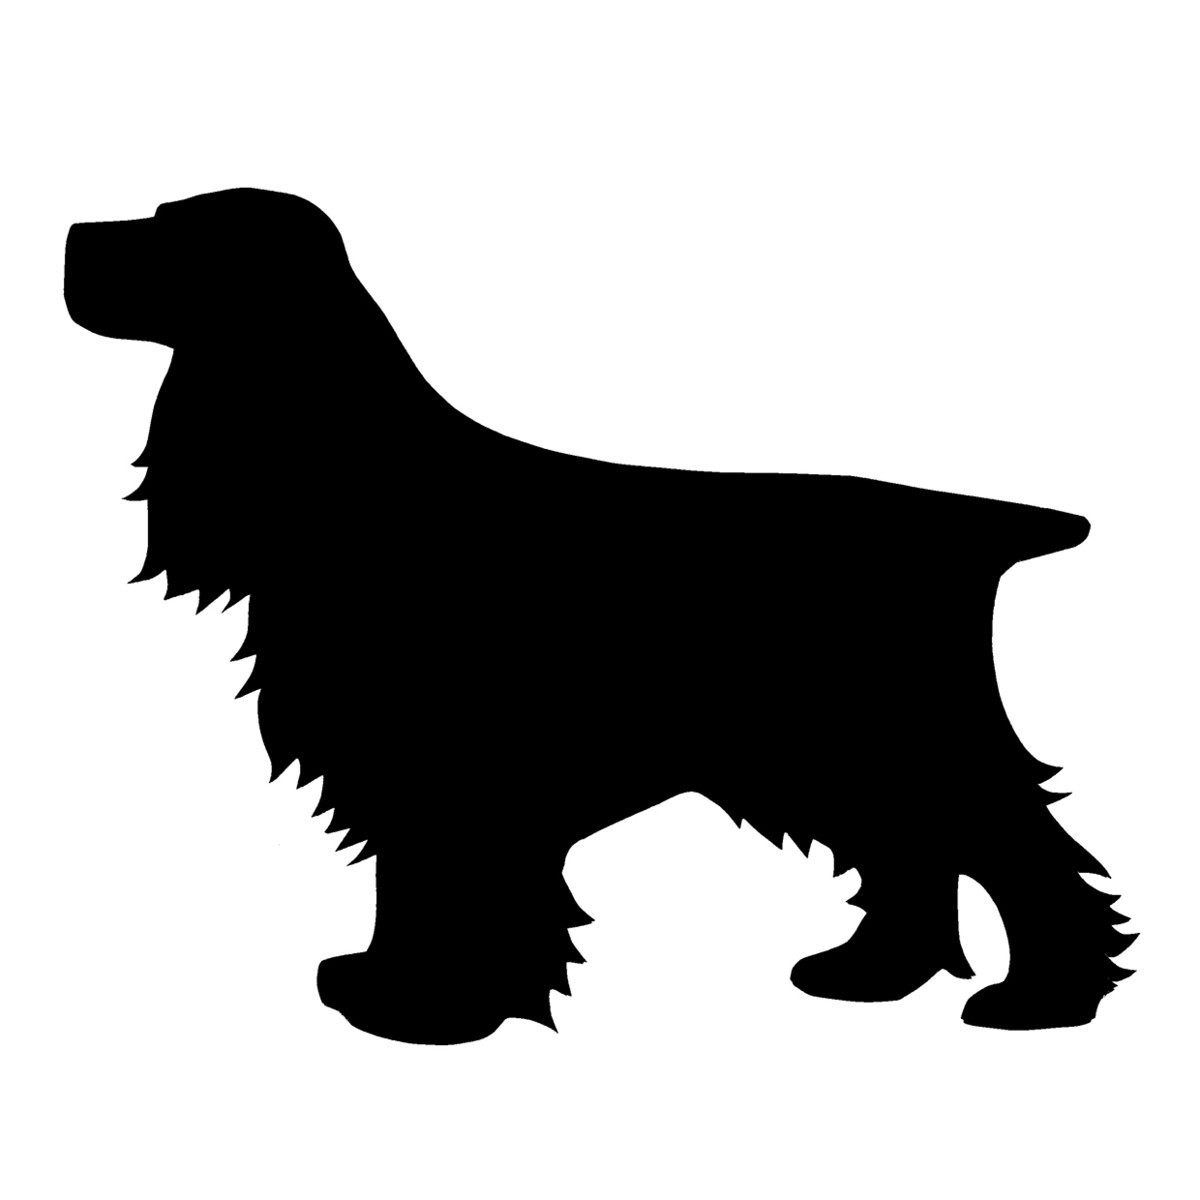 1200x1200 Lol! Temporary Tattoos Of Your Dog. Cocker Spaniel